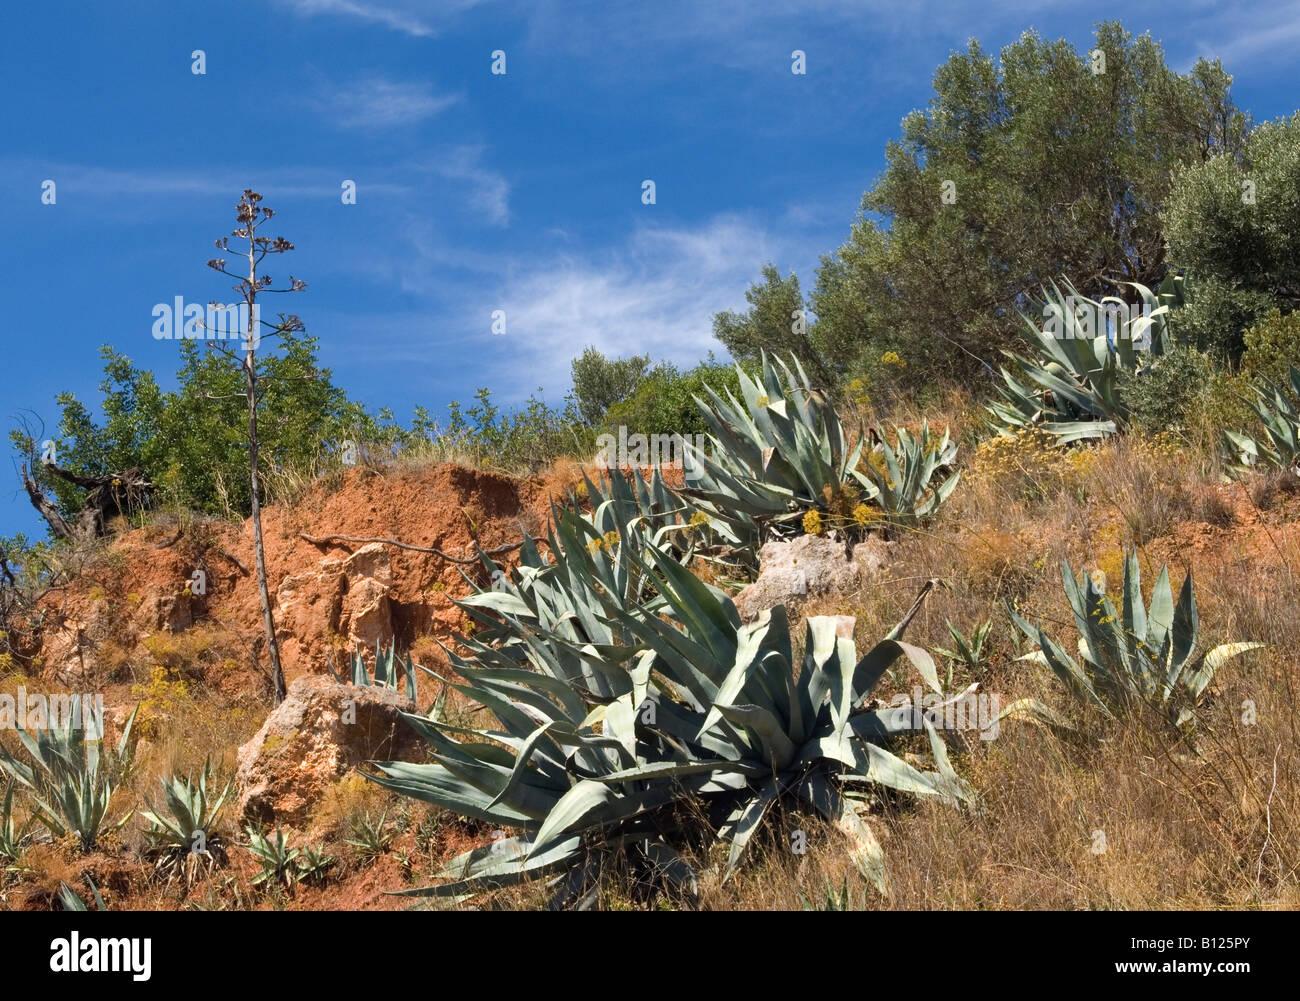 Native Plants Portugal Stock Photo Royalty Free Image - Portugal vegetation map